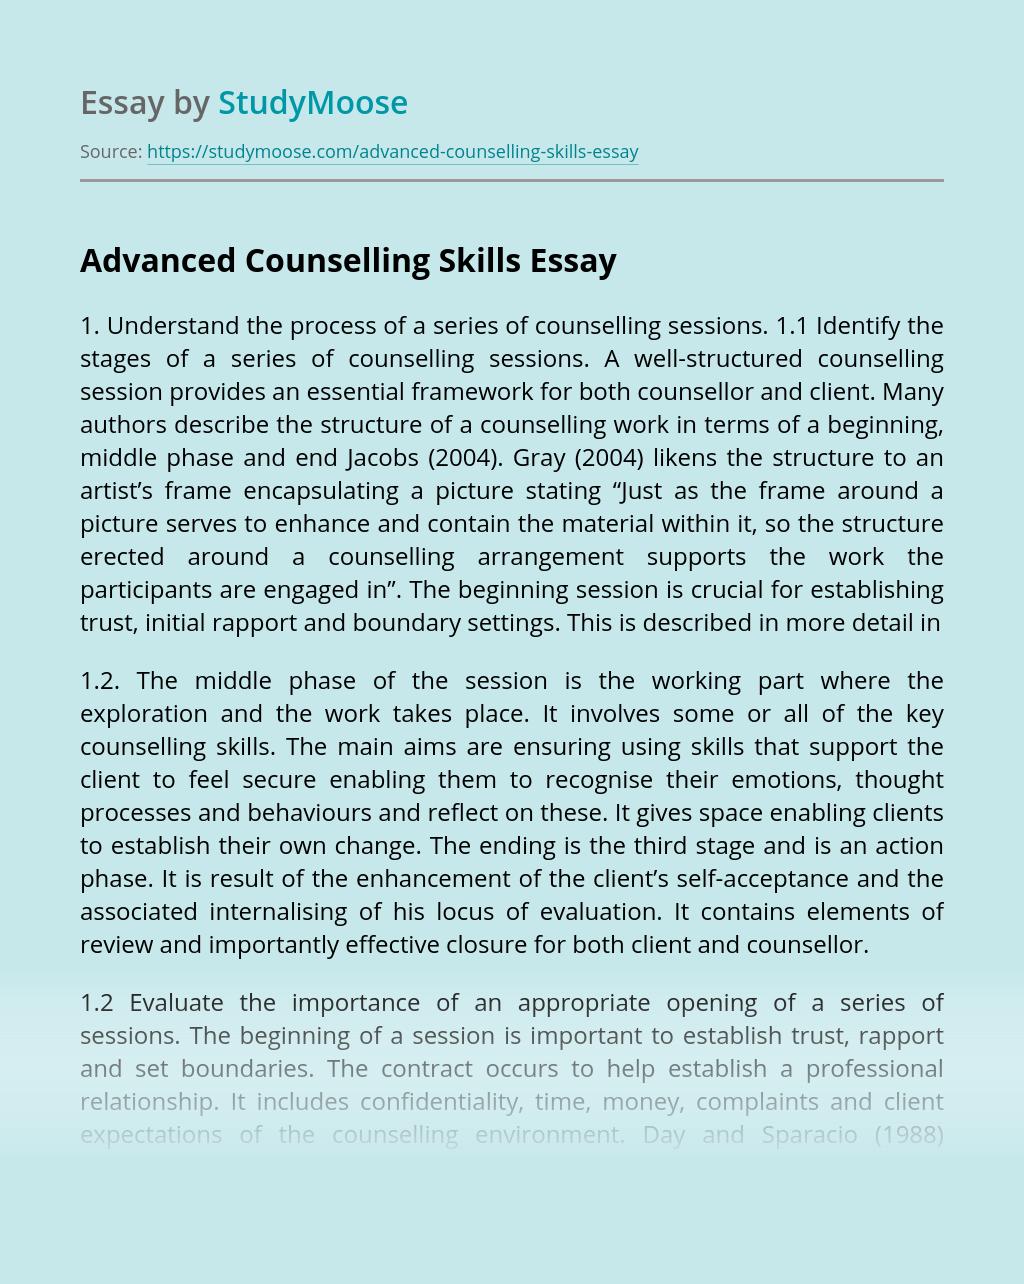 Advanced Counselling Skills